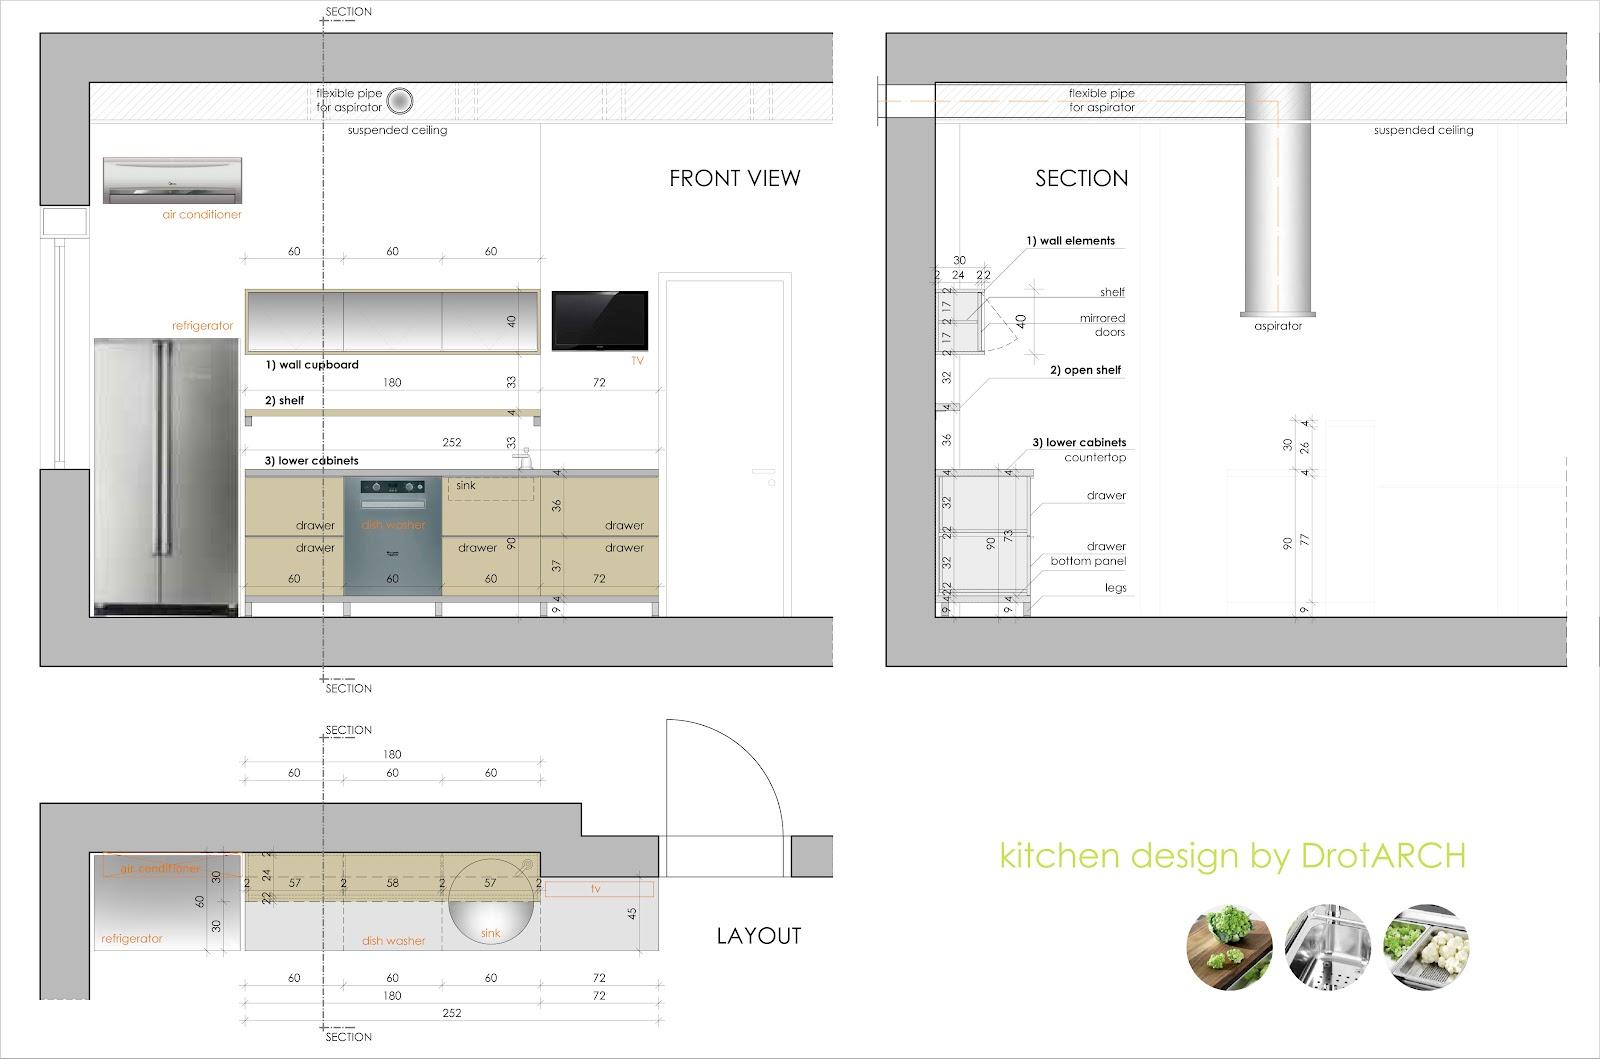 Uncategorized Kitchen Details And Design drotarch kitchen design design